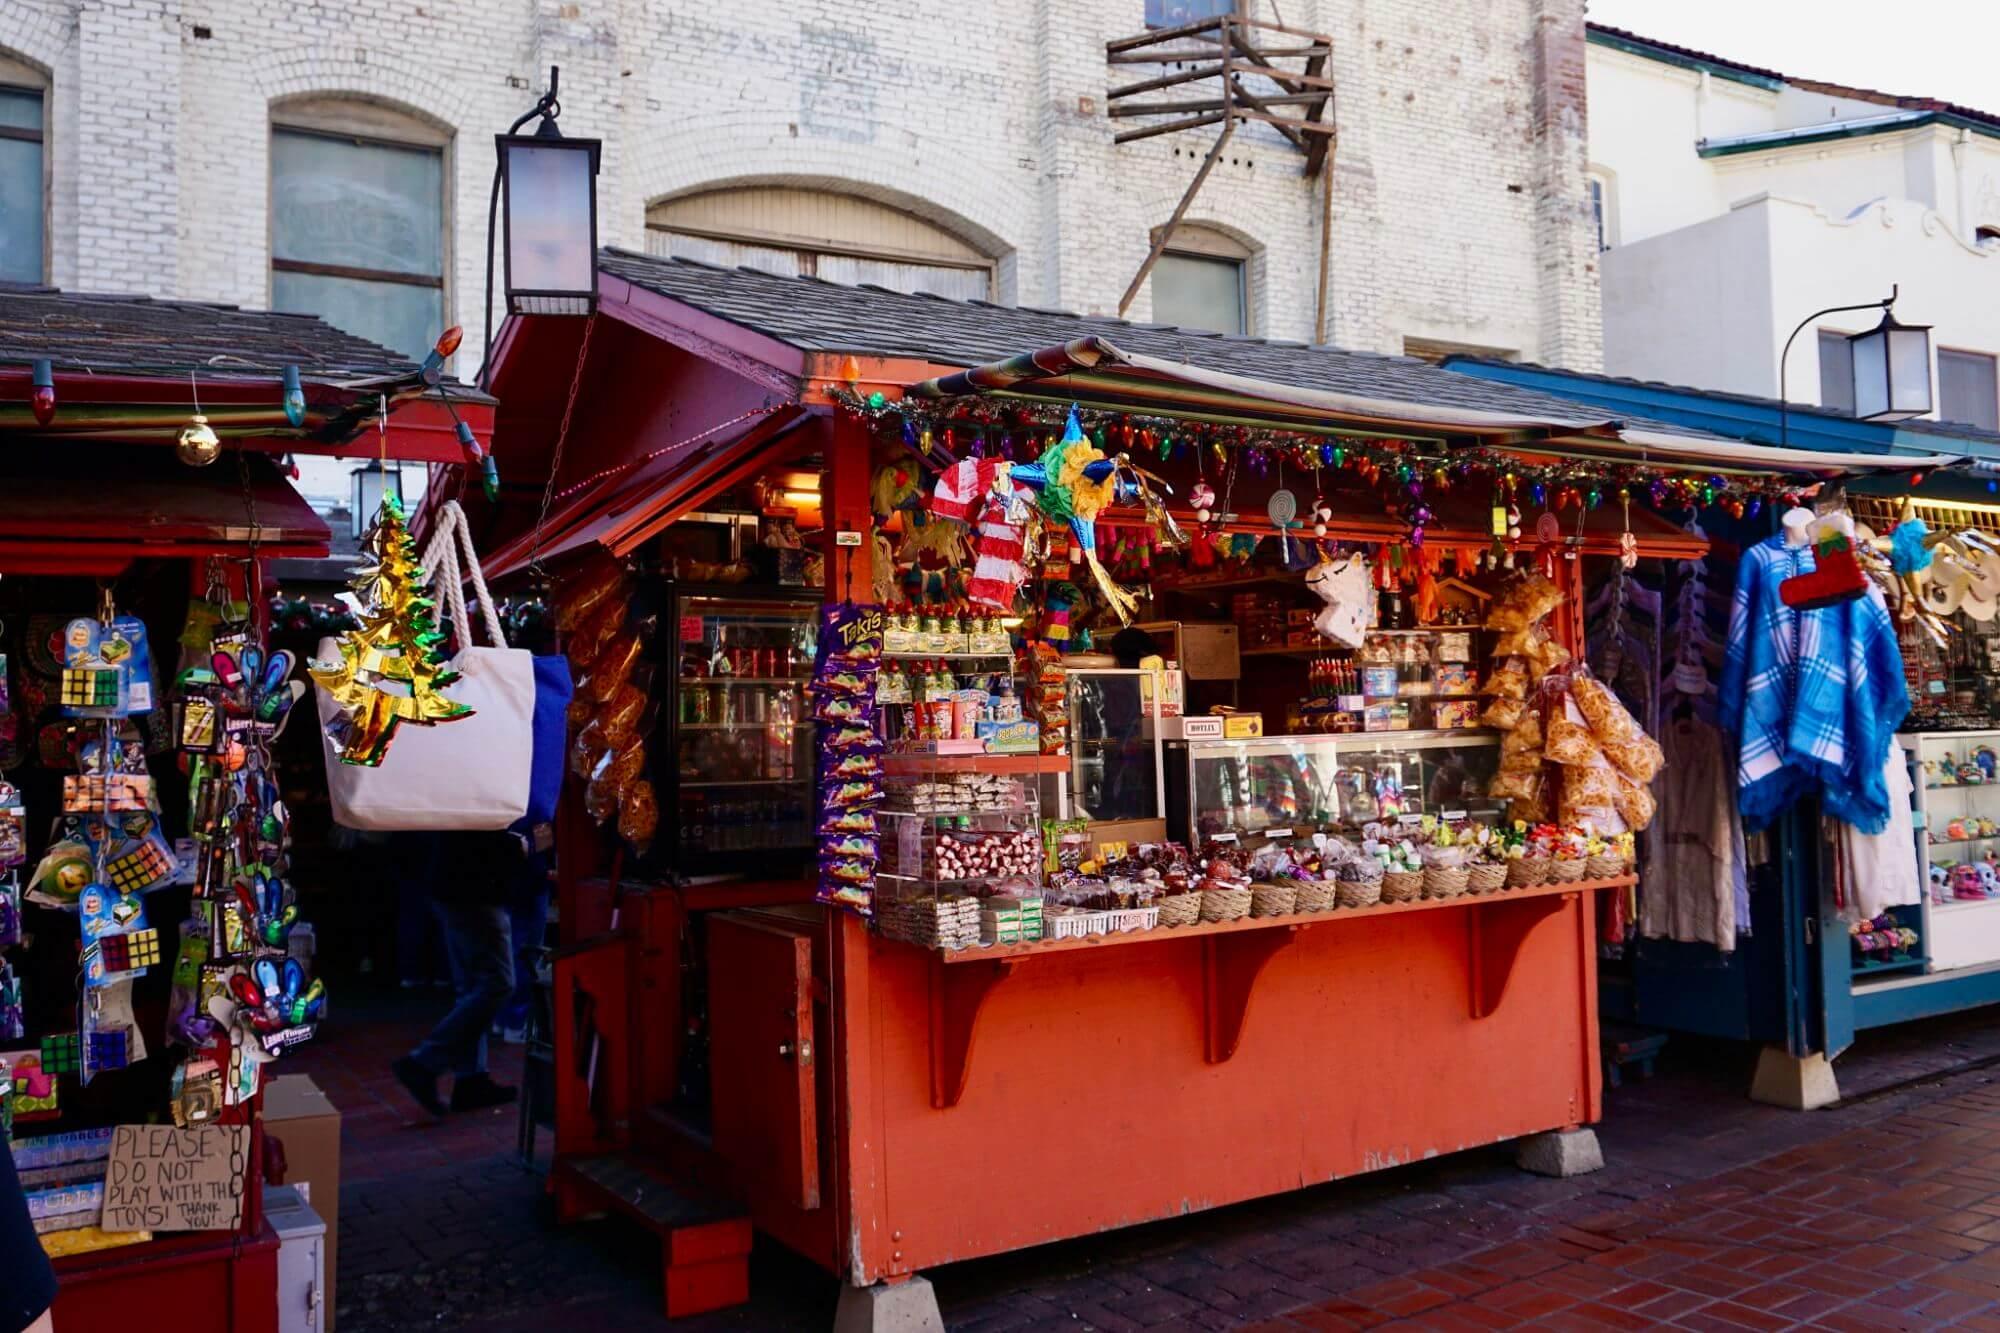 Olvera Street shopping stalls